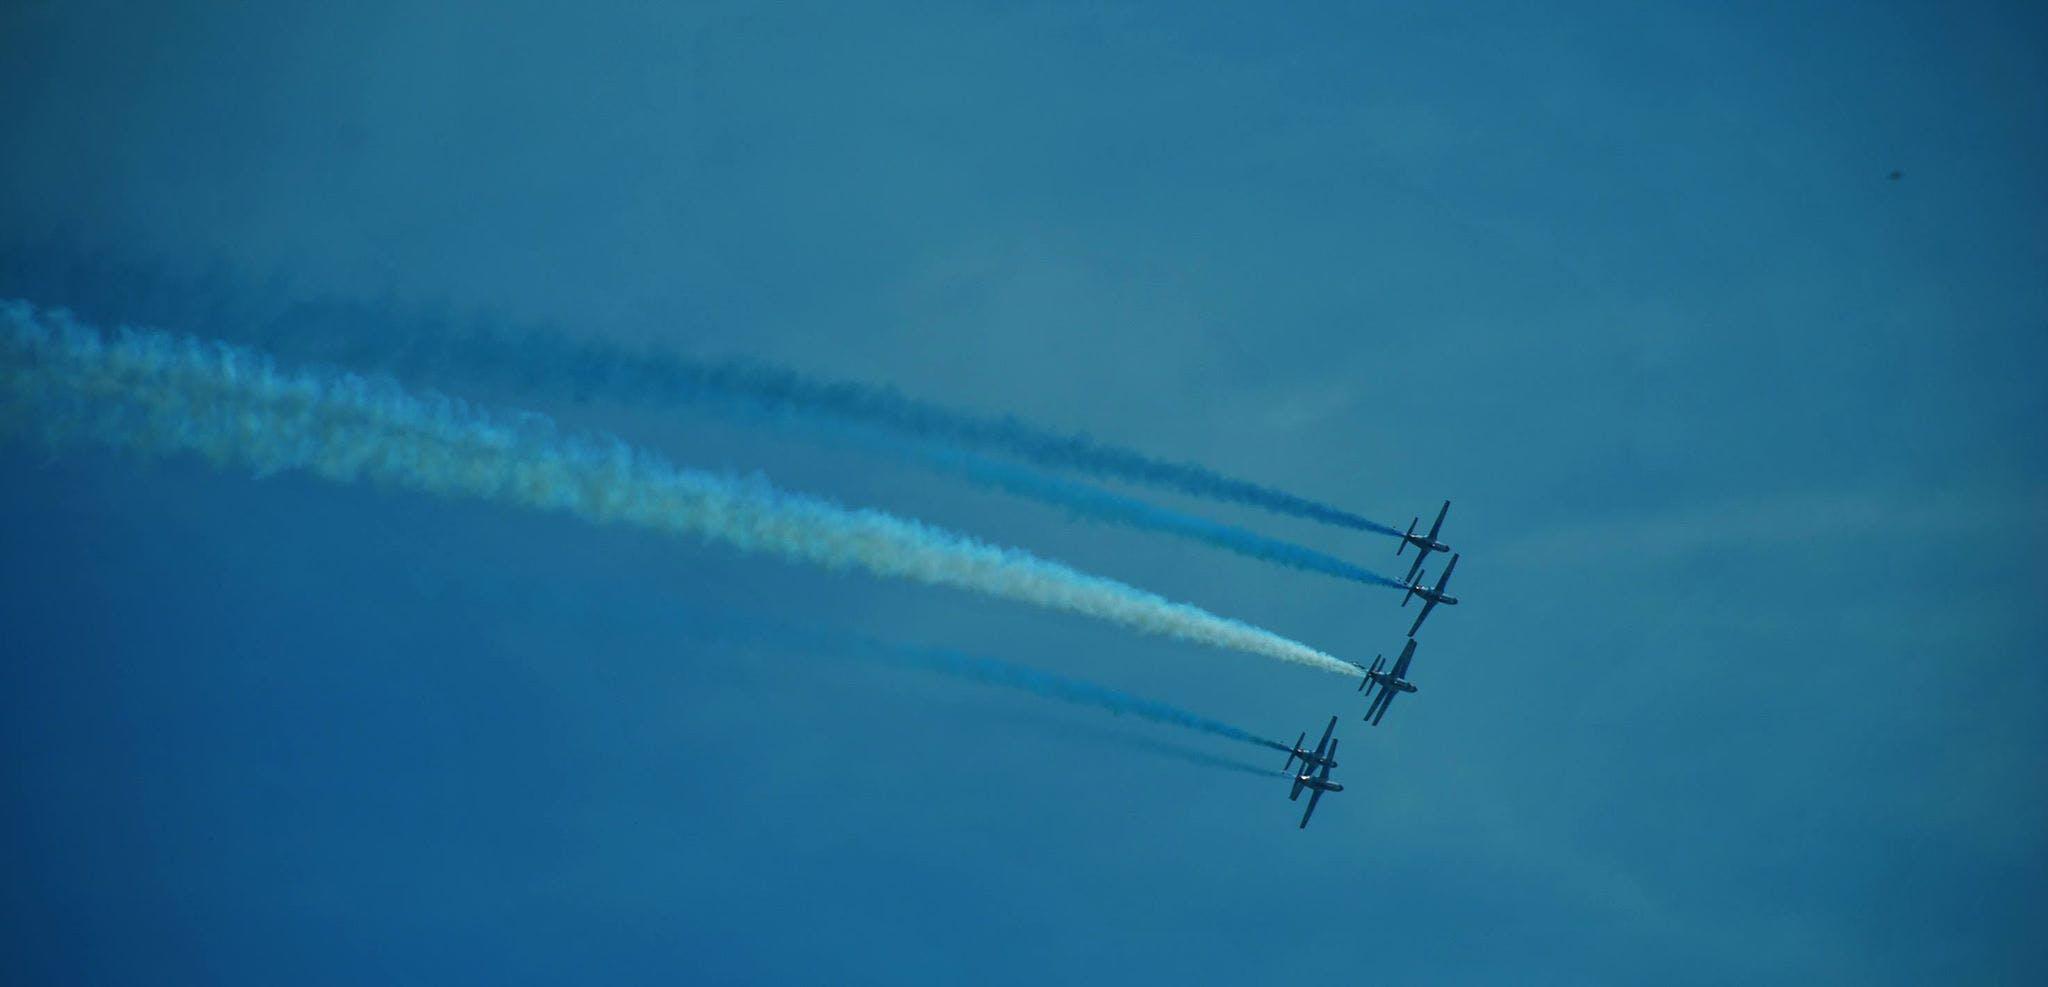 6 Flying Aircraft